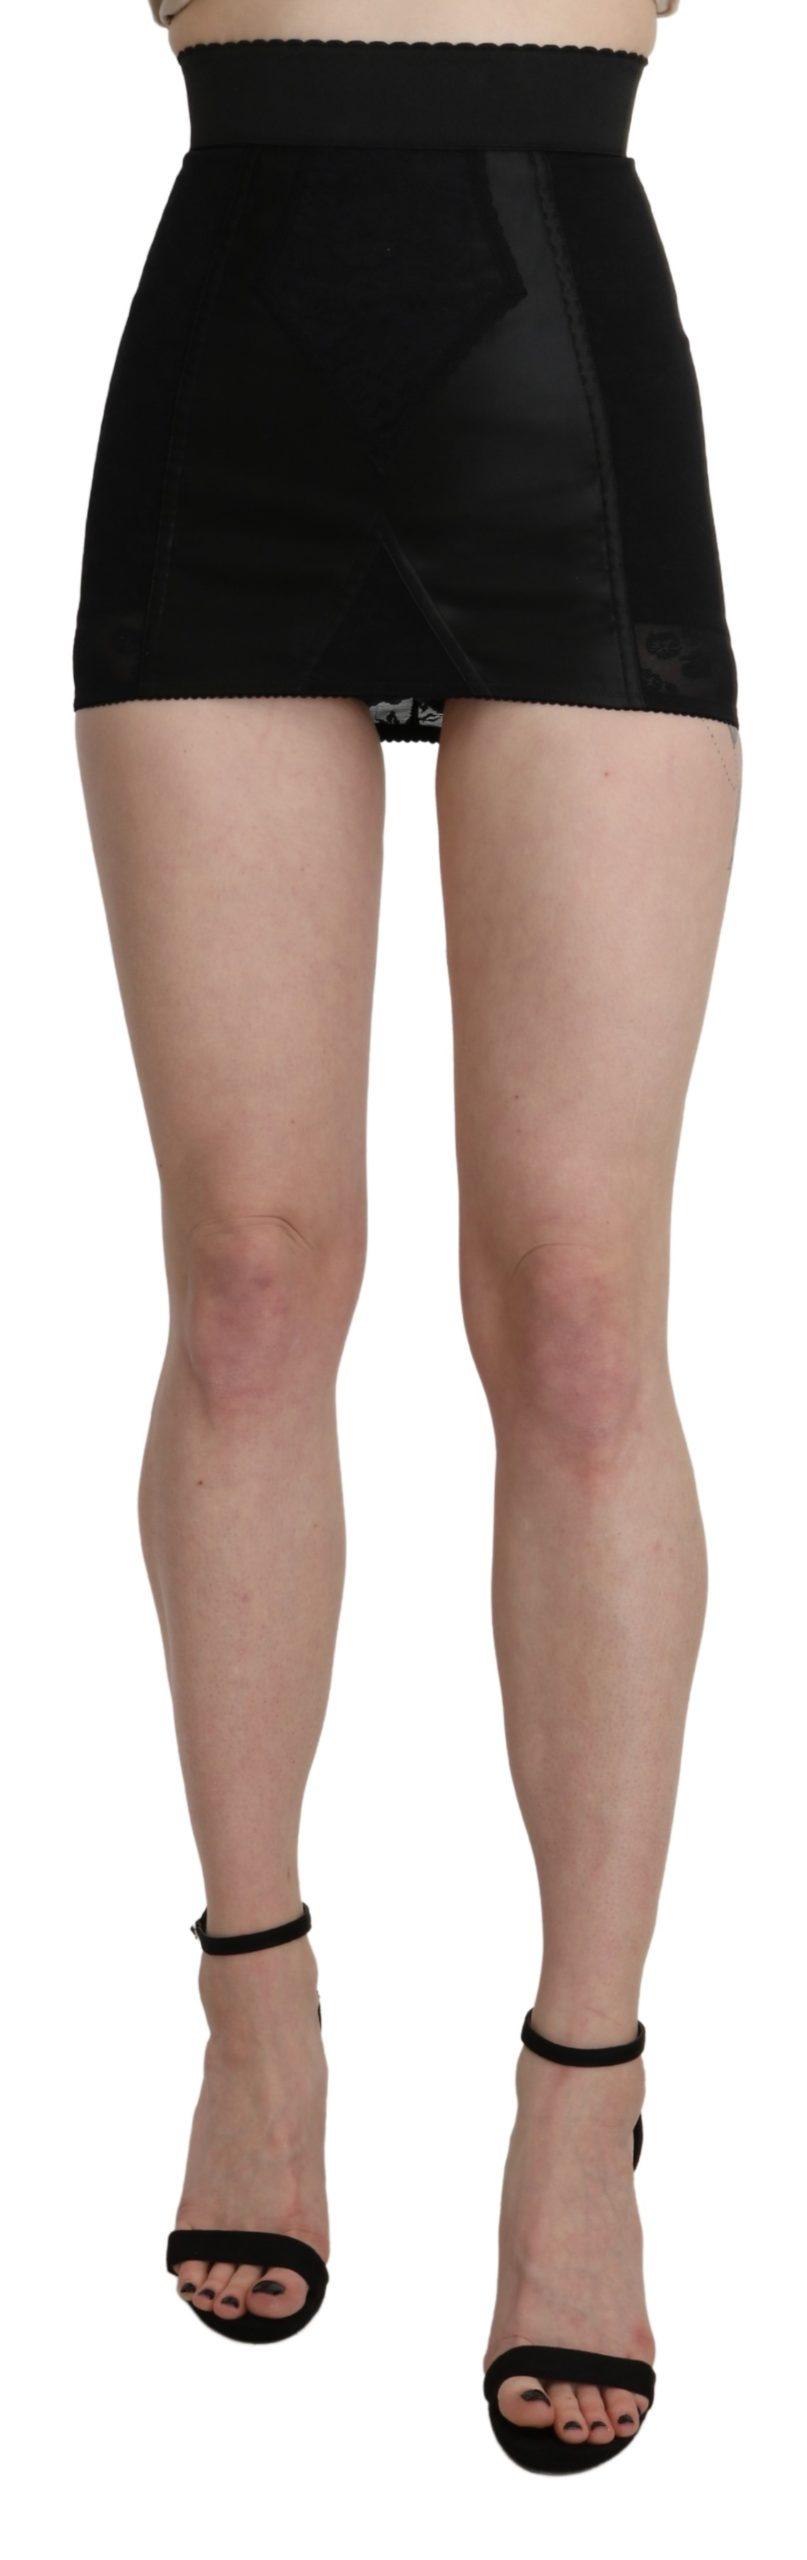 Black Underskirt Short Lace Stretch Skirt - IT36 | XS